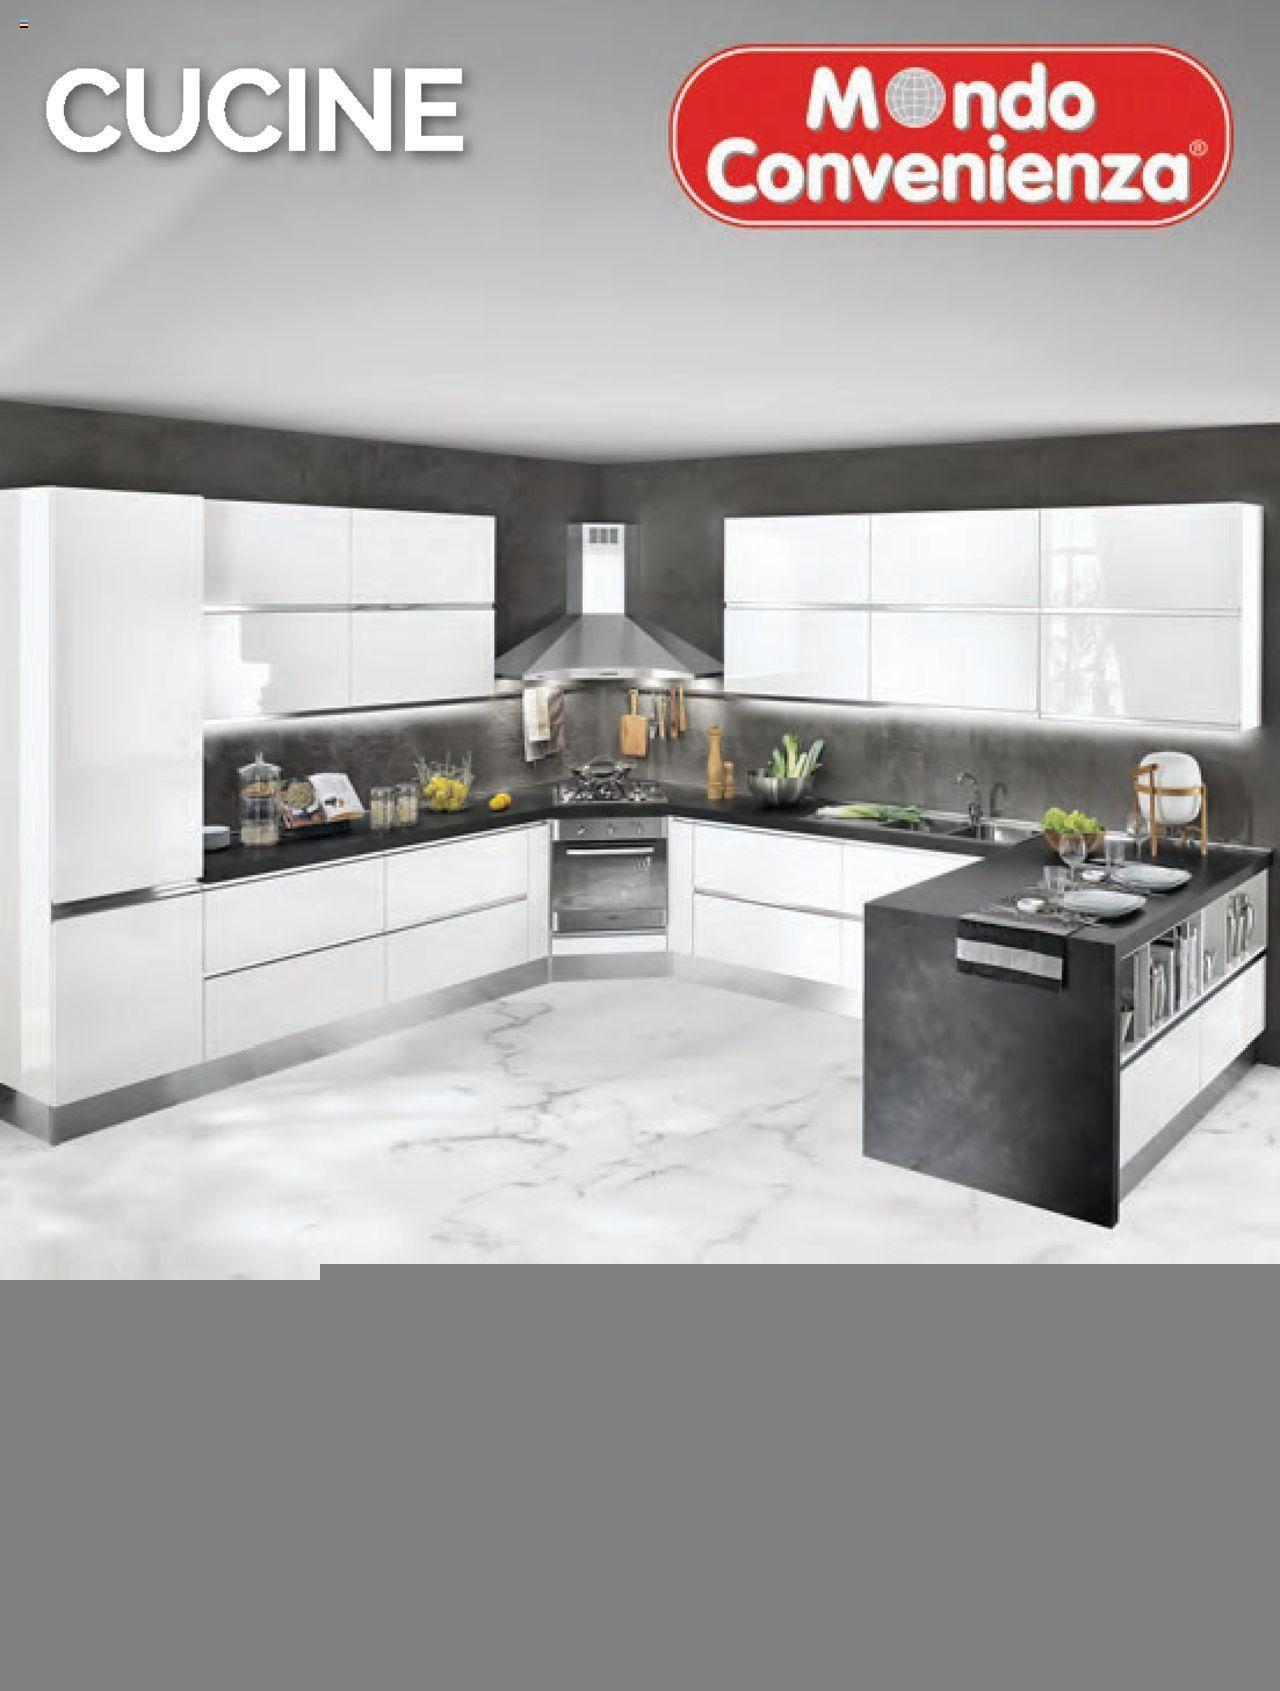 Catalogo Mondo Convenienza Cucine Dal 1 10 2020 Al 1 06 2021 Cucine Arredamento Catalogo